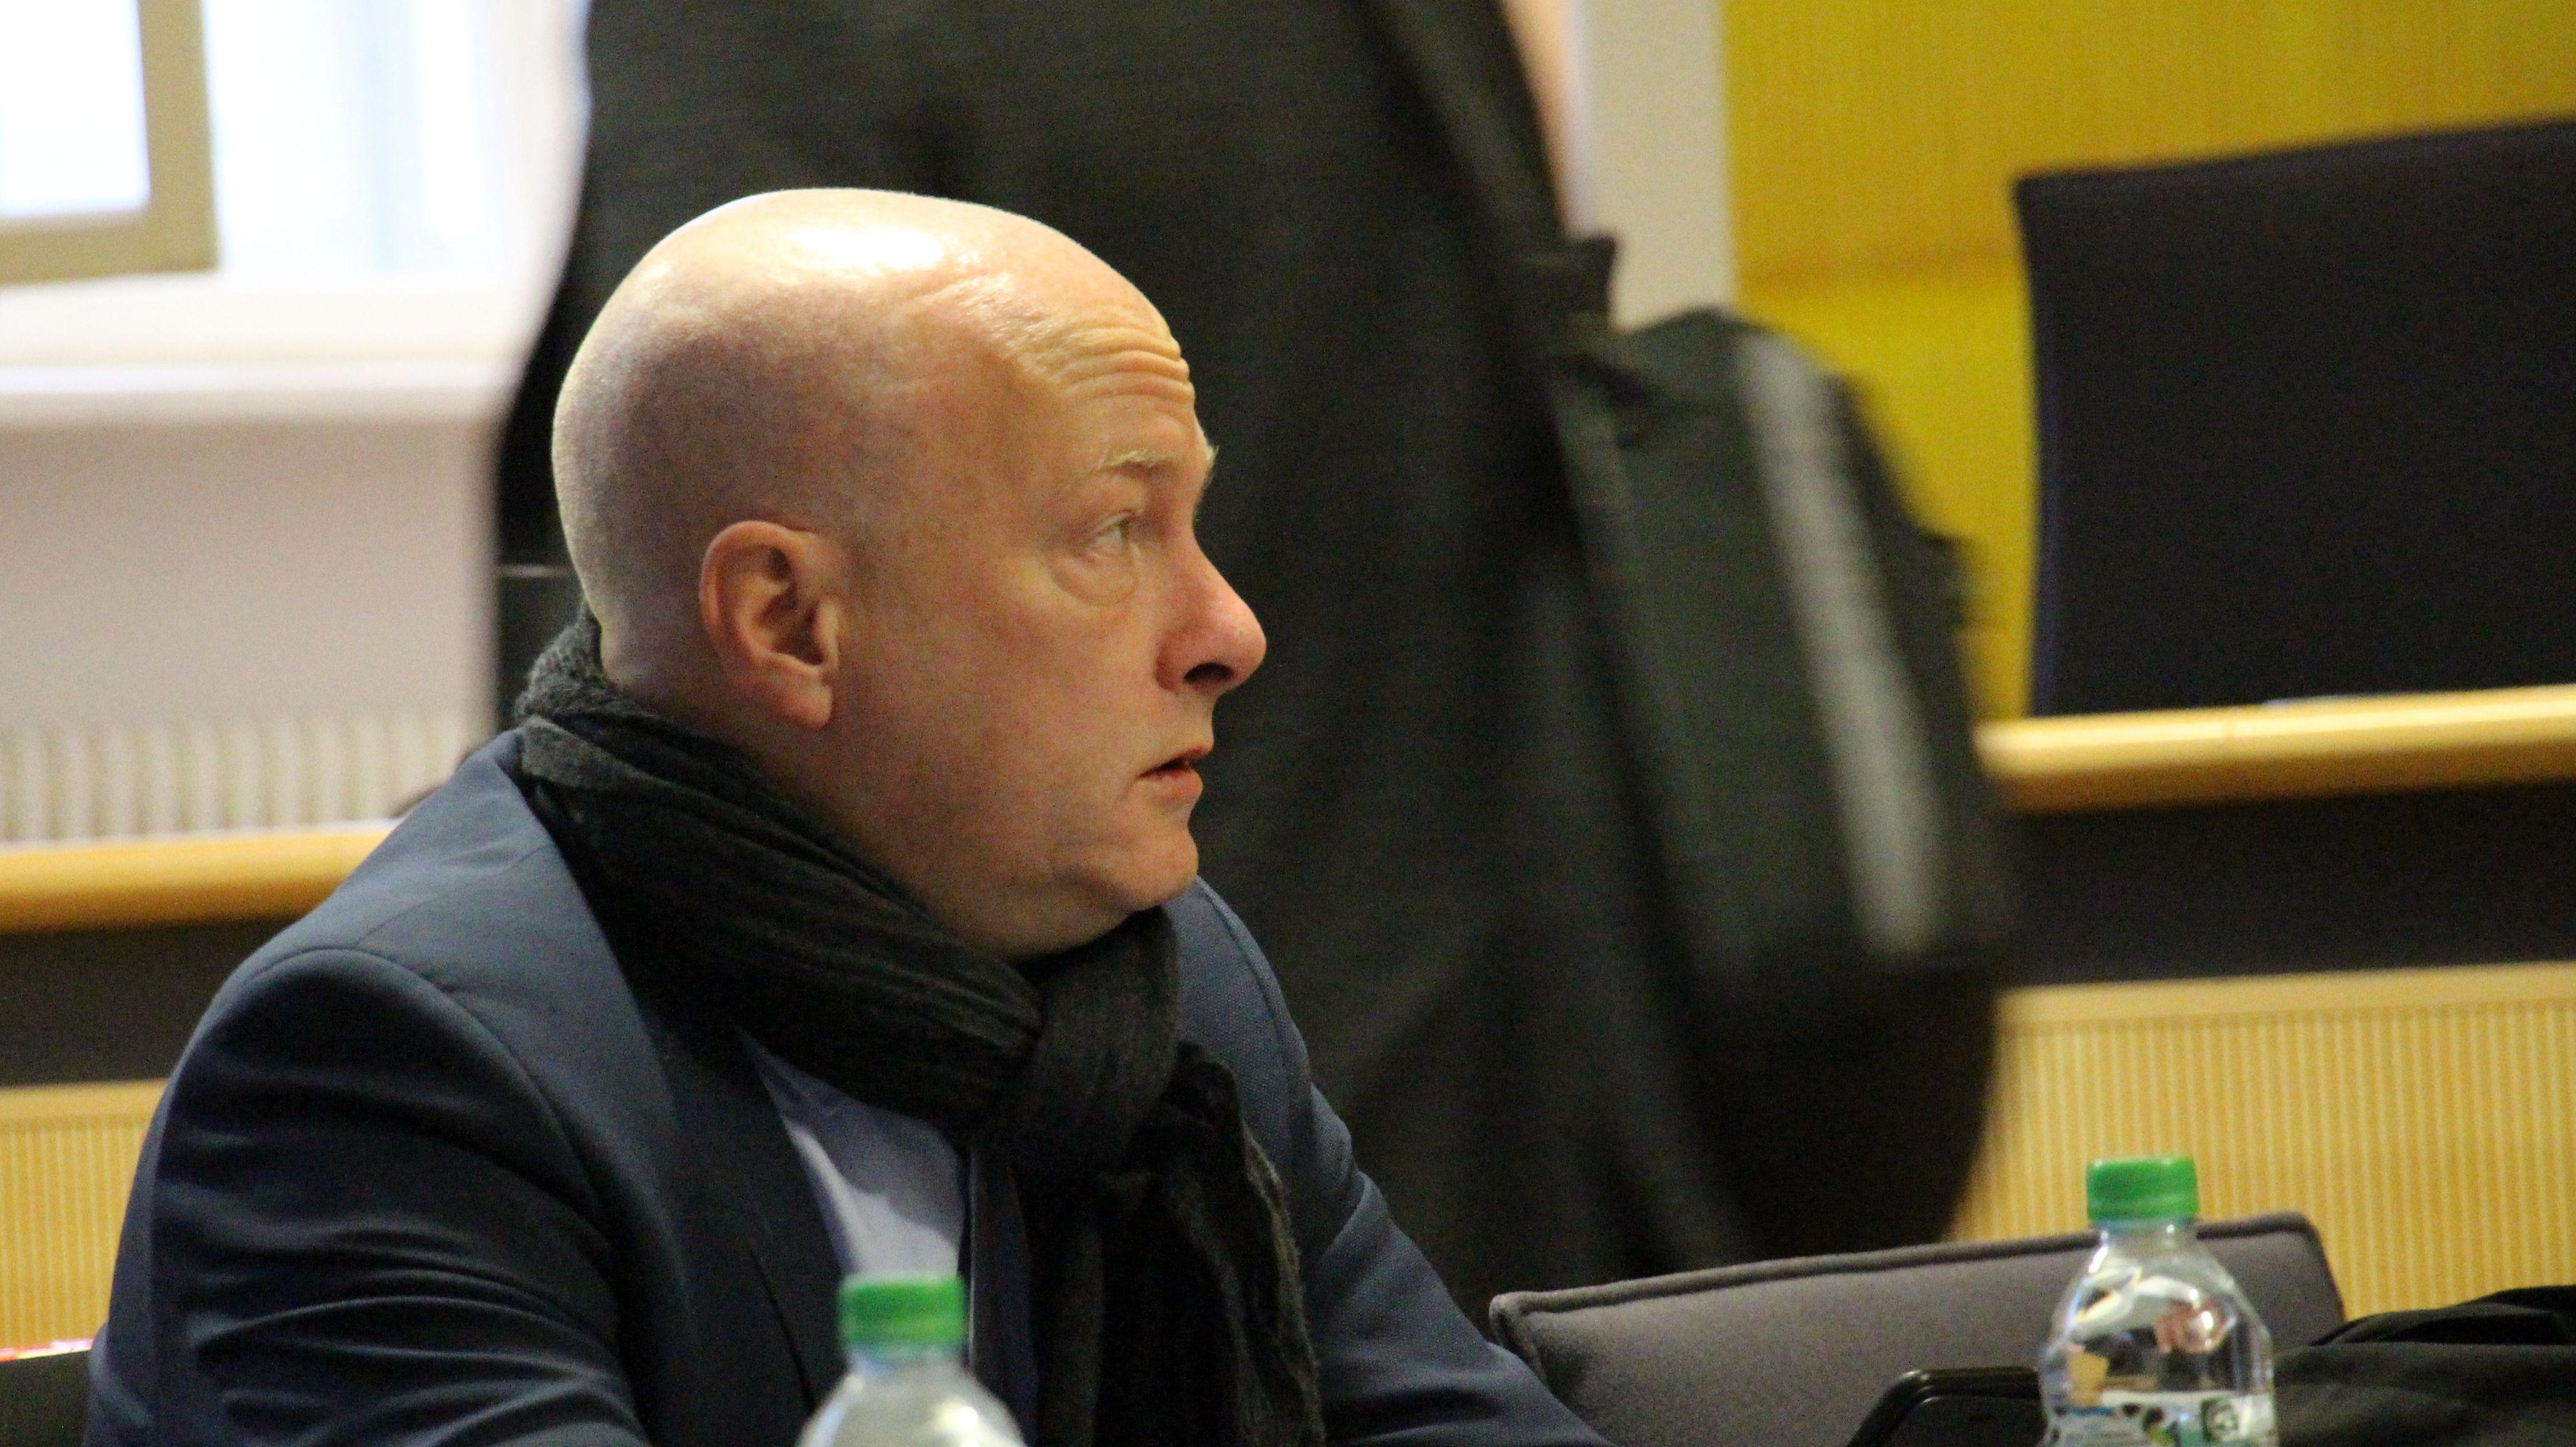 Regensburgs suspendierter OB Joachim Wolbergs im Gerichtssaal.